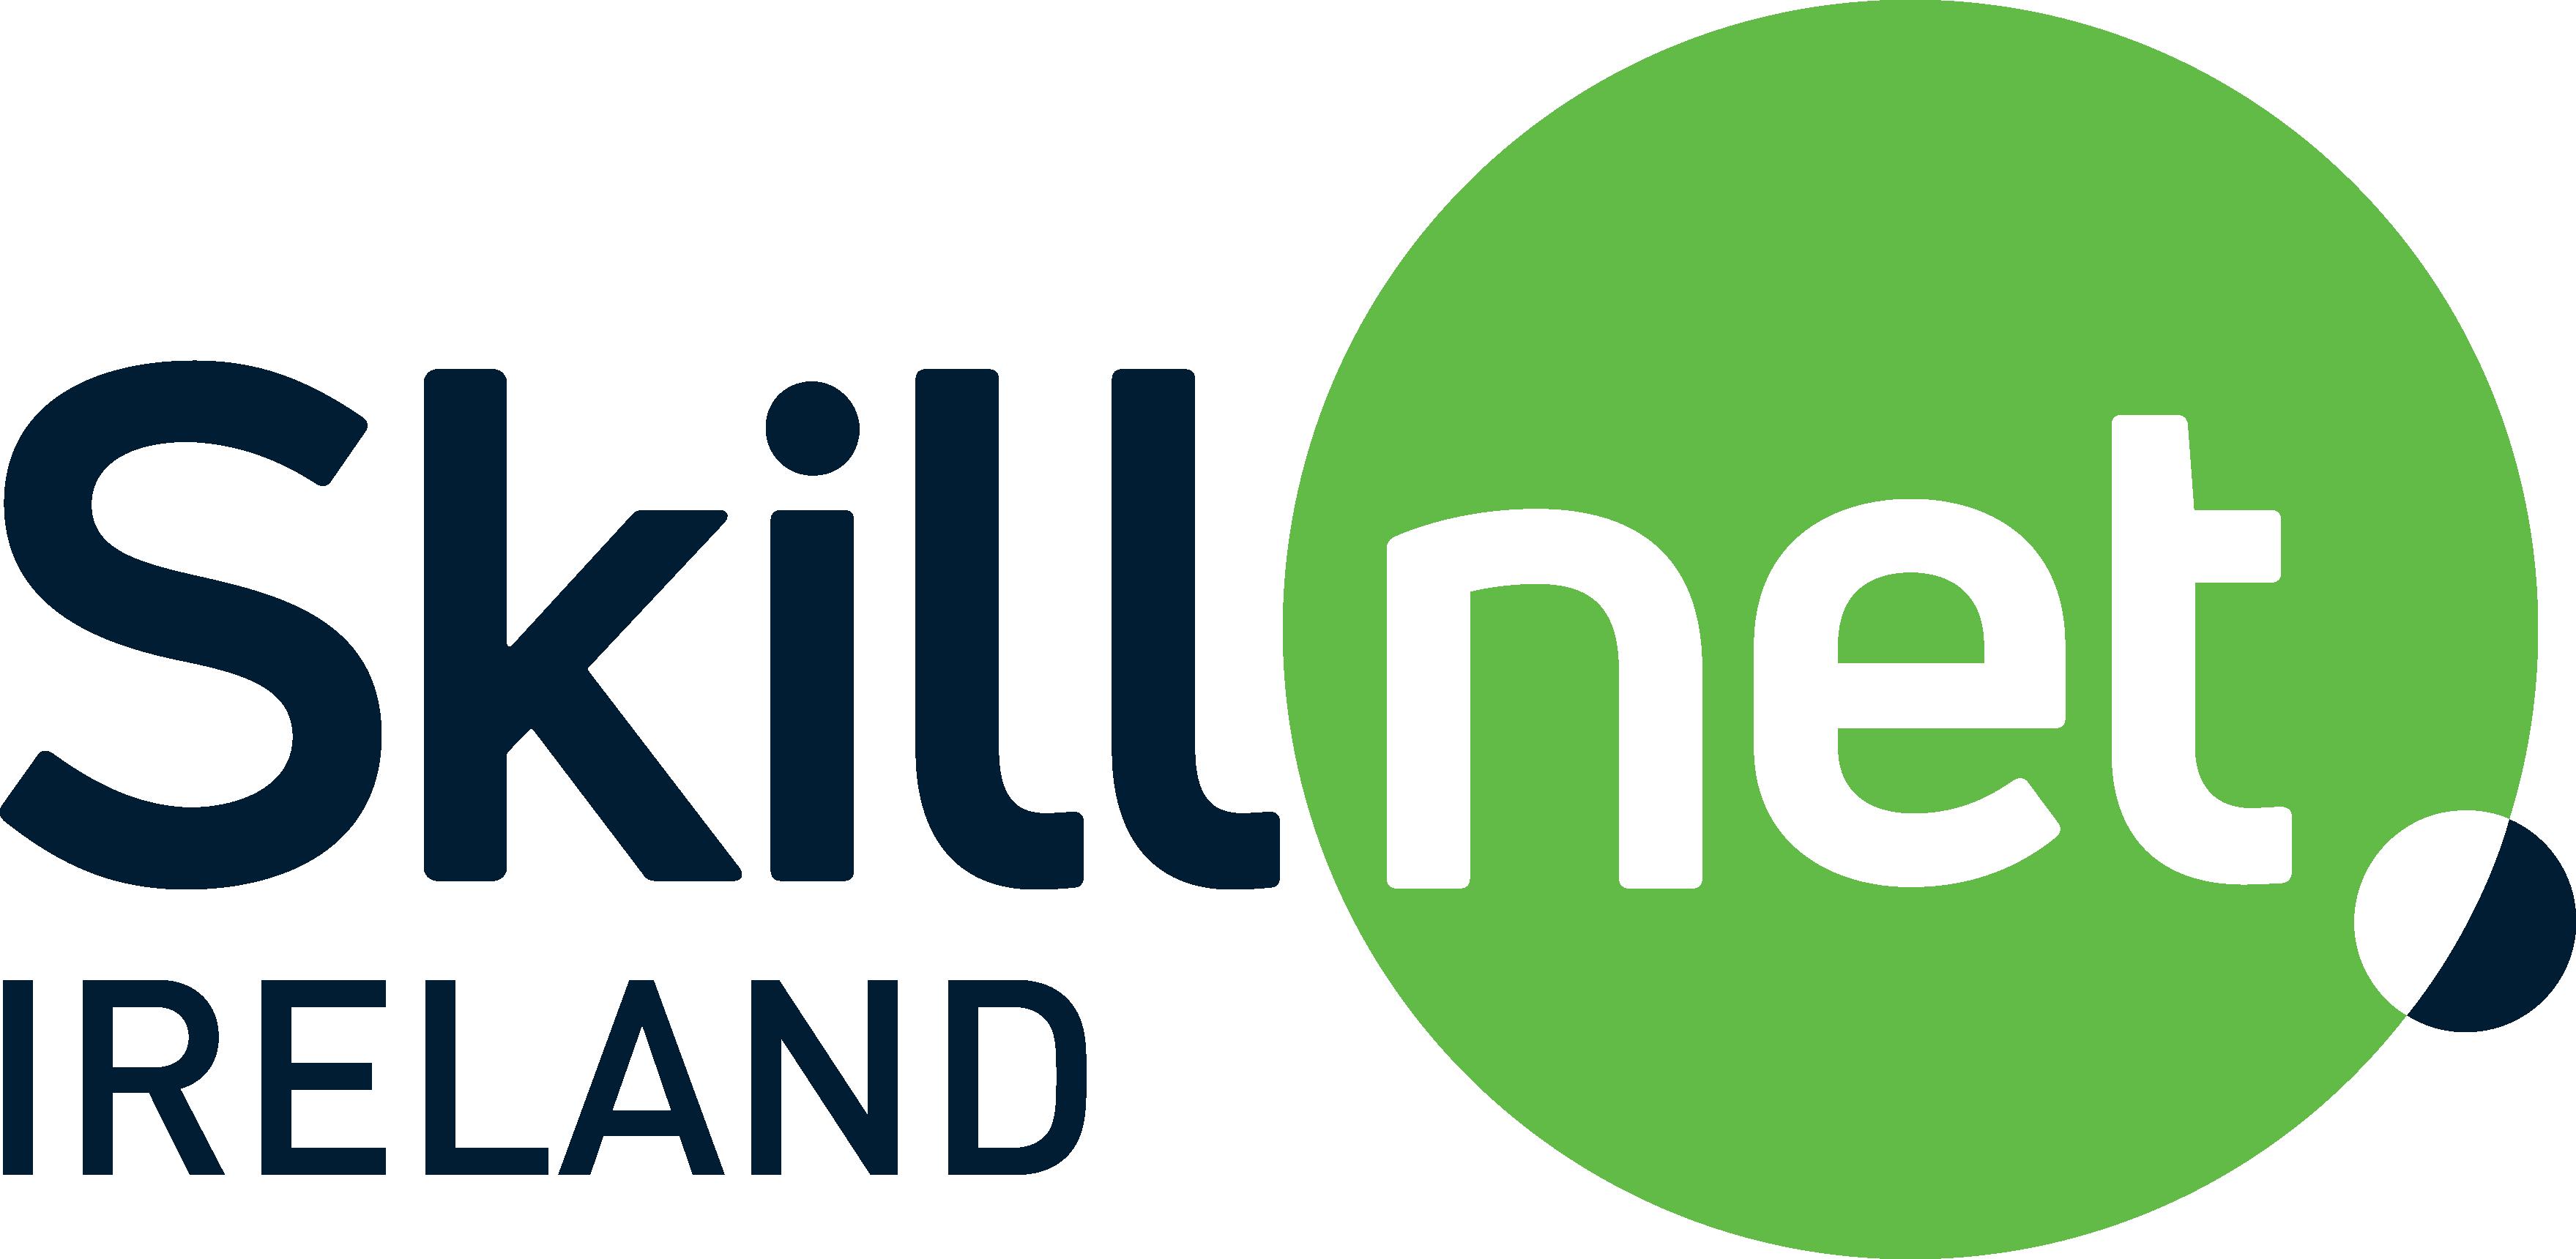 Skillnet Ireland logo